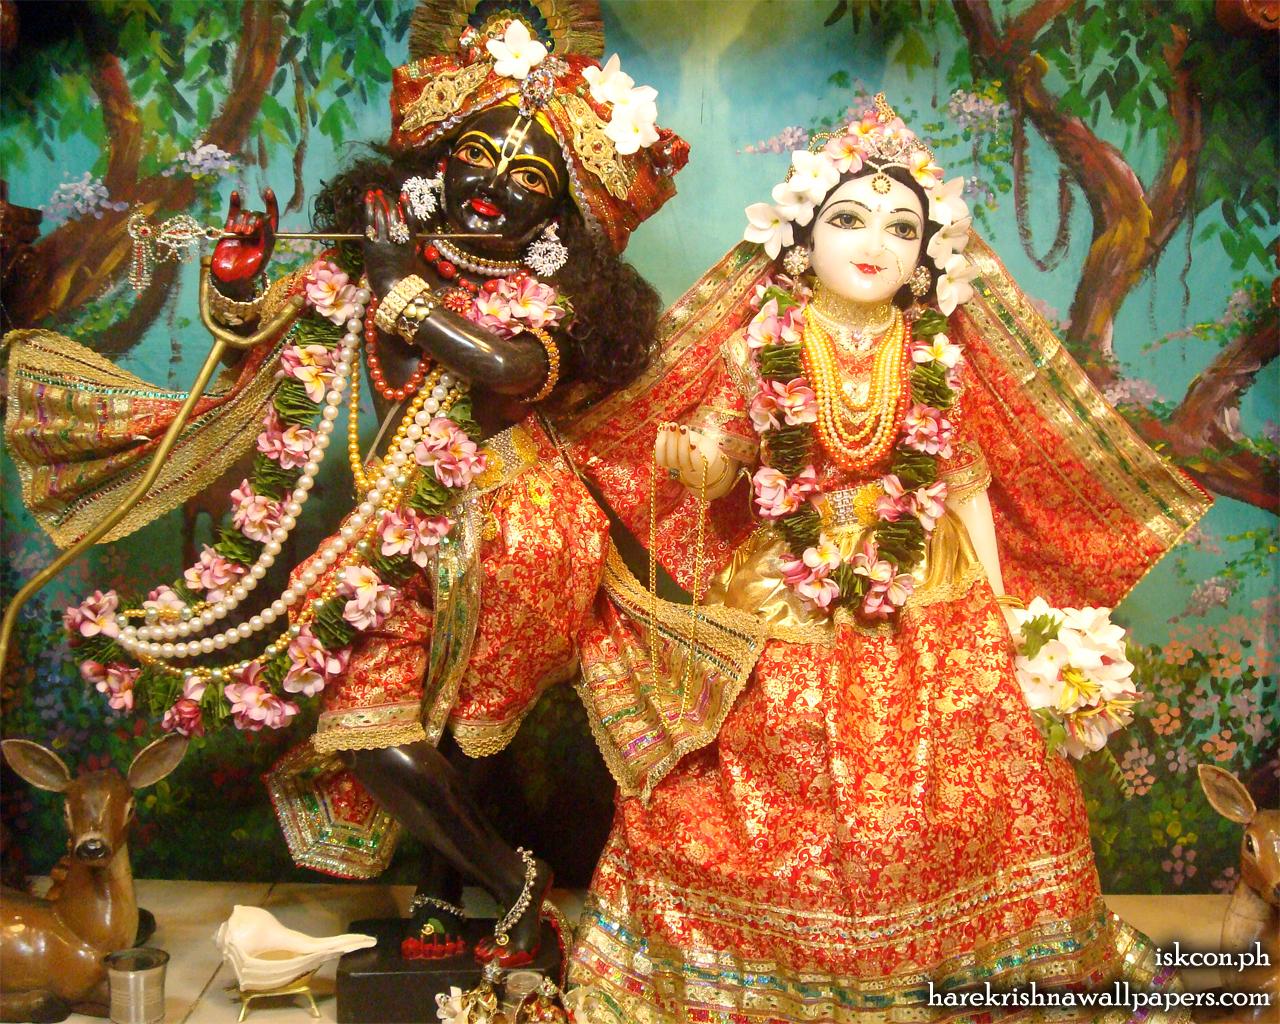 Sri Sri Radha Madhava Wallpaper (012) Size 1280x1024 Download